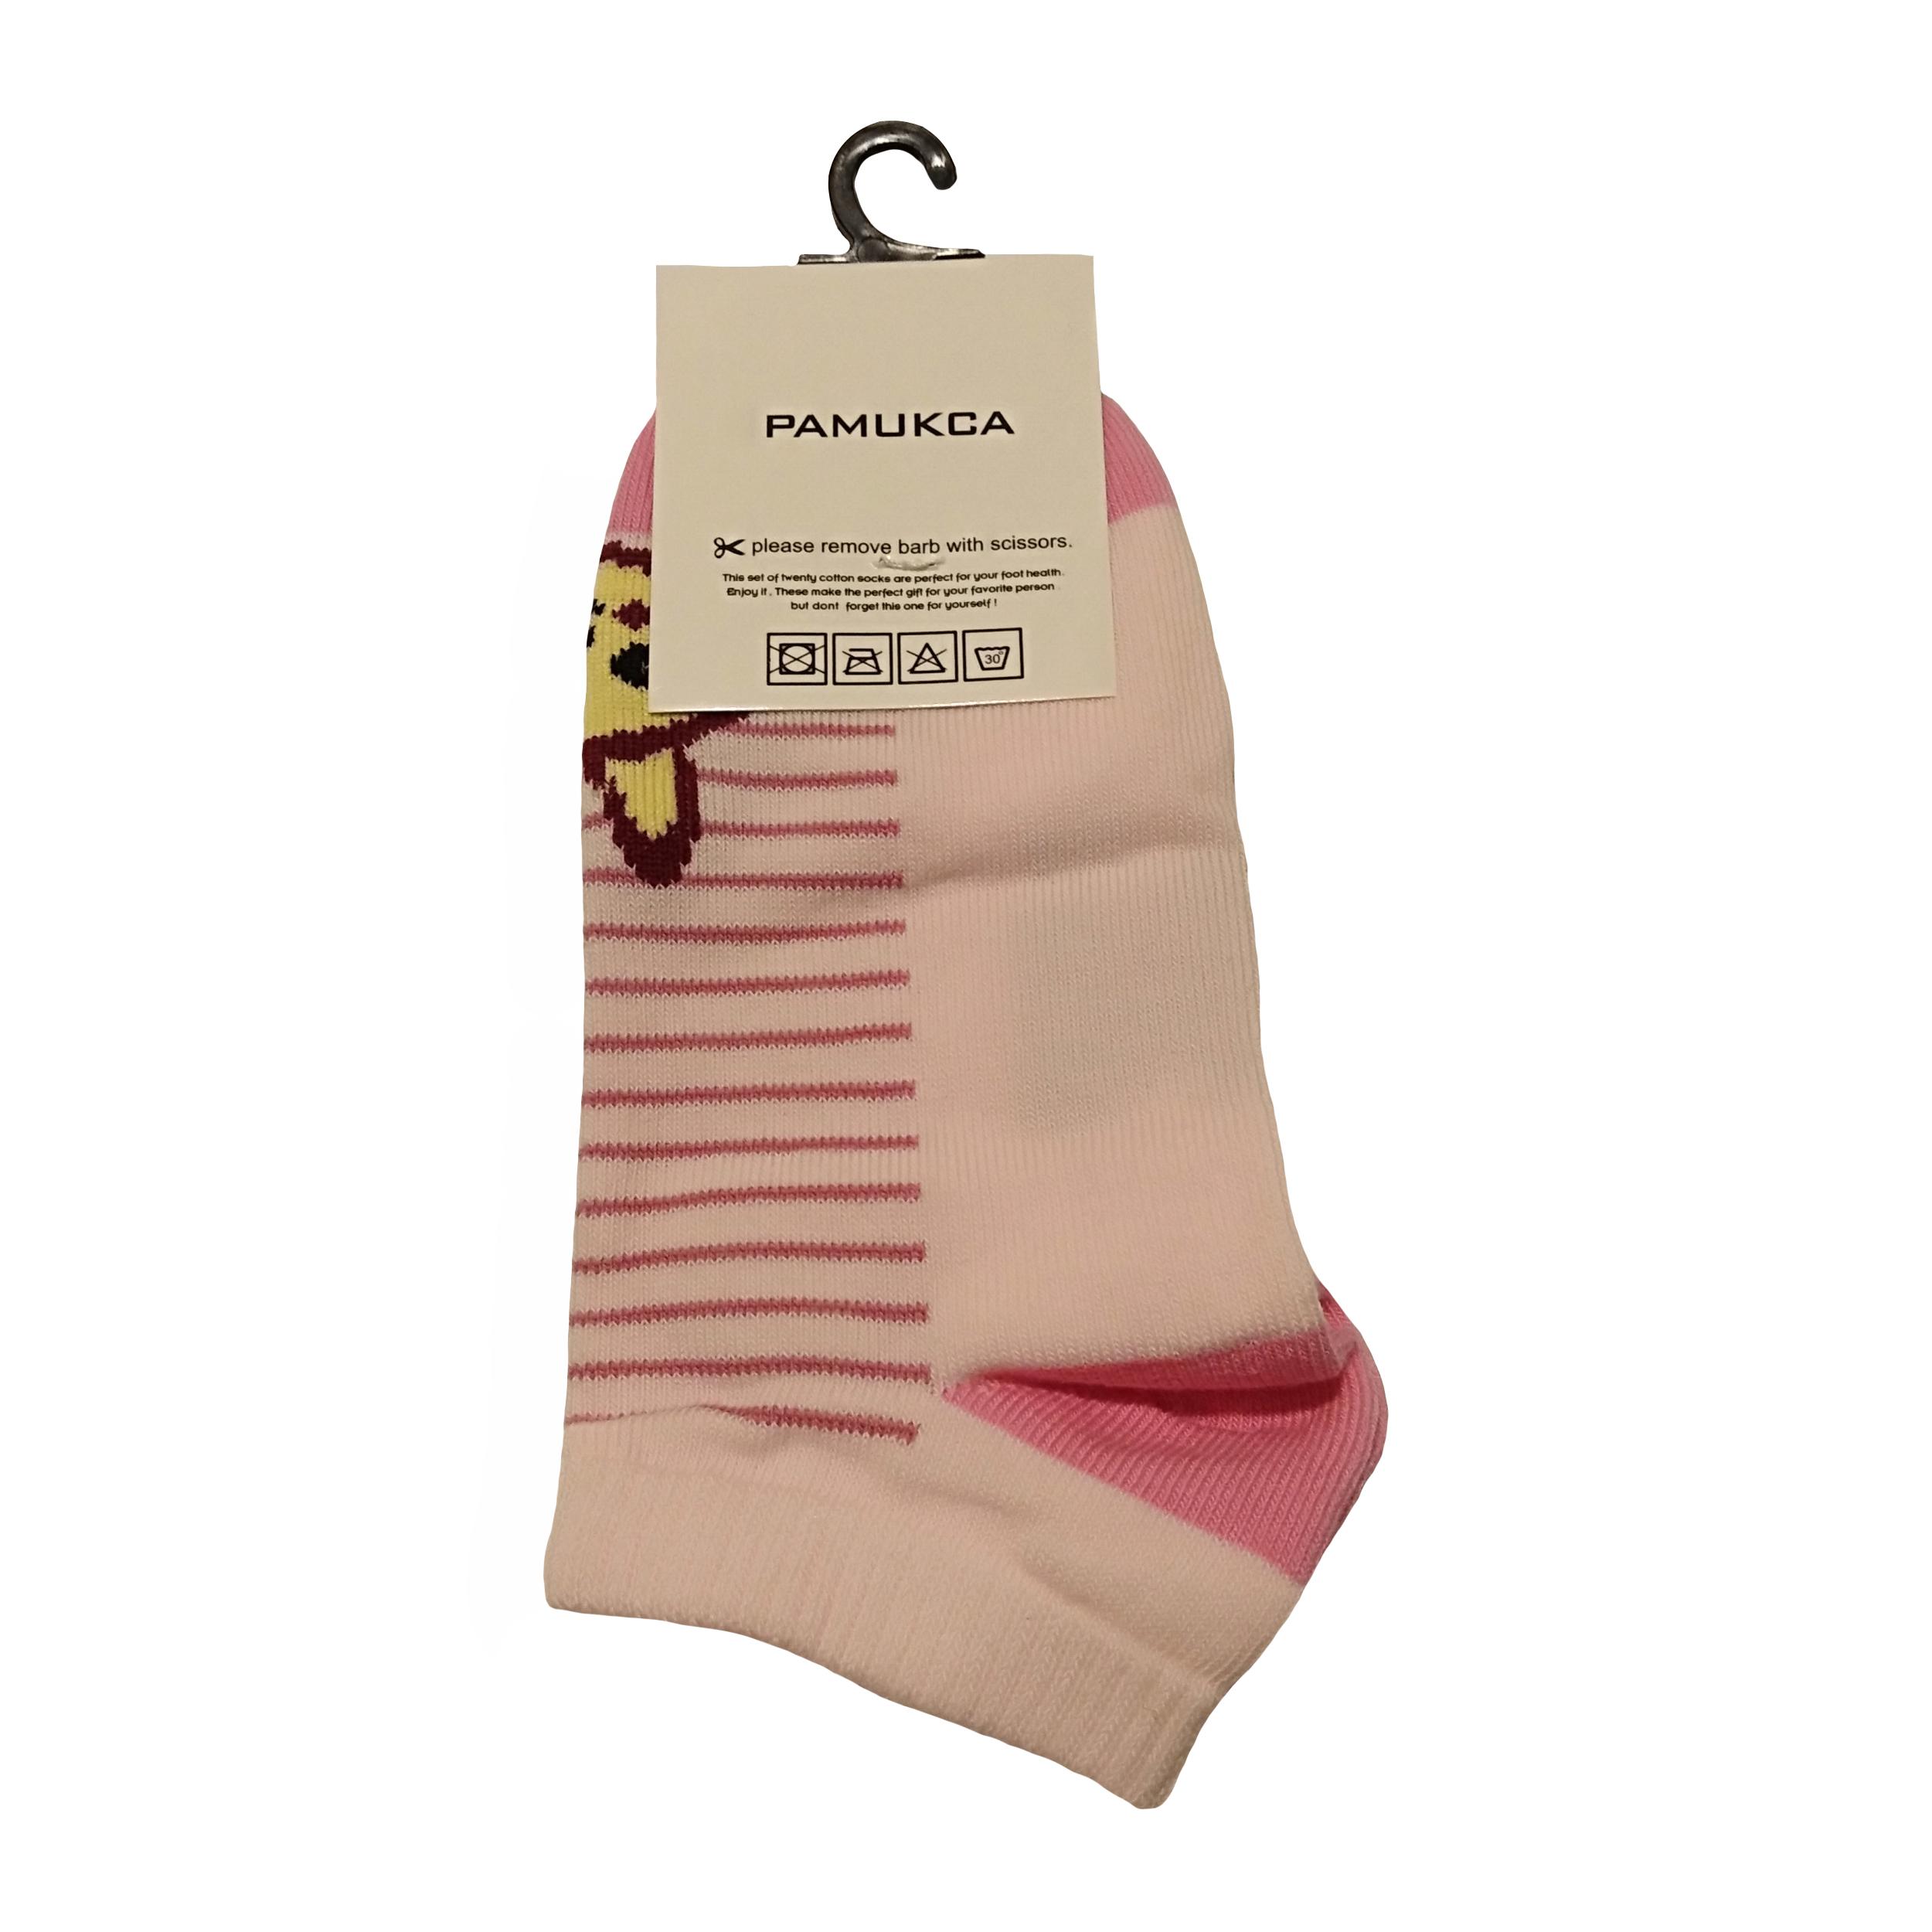 جوراب بچگانه پاموکا مدل A-6 -  - 2